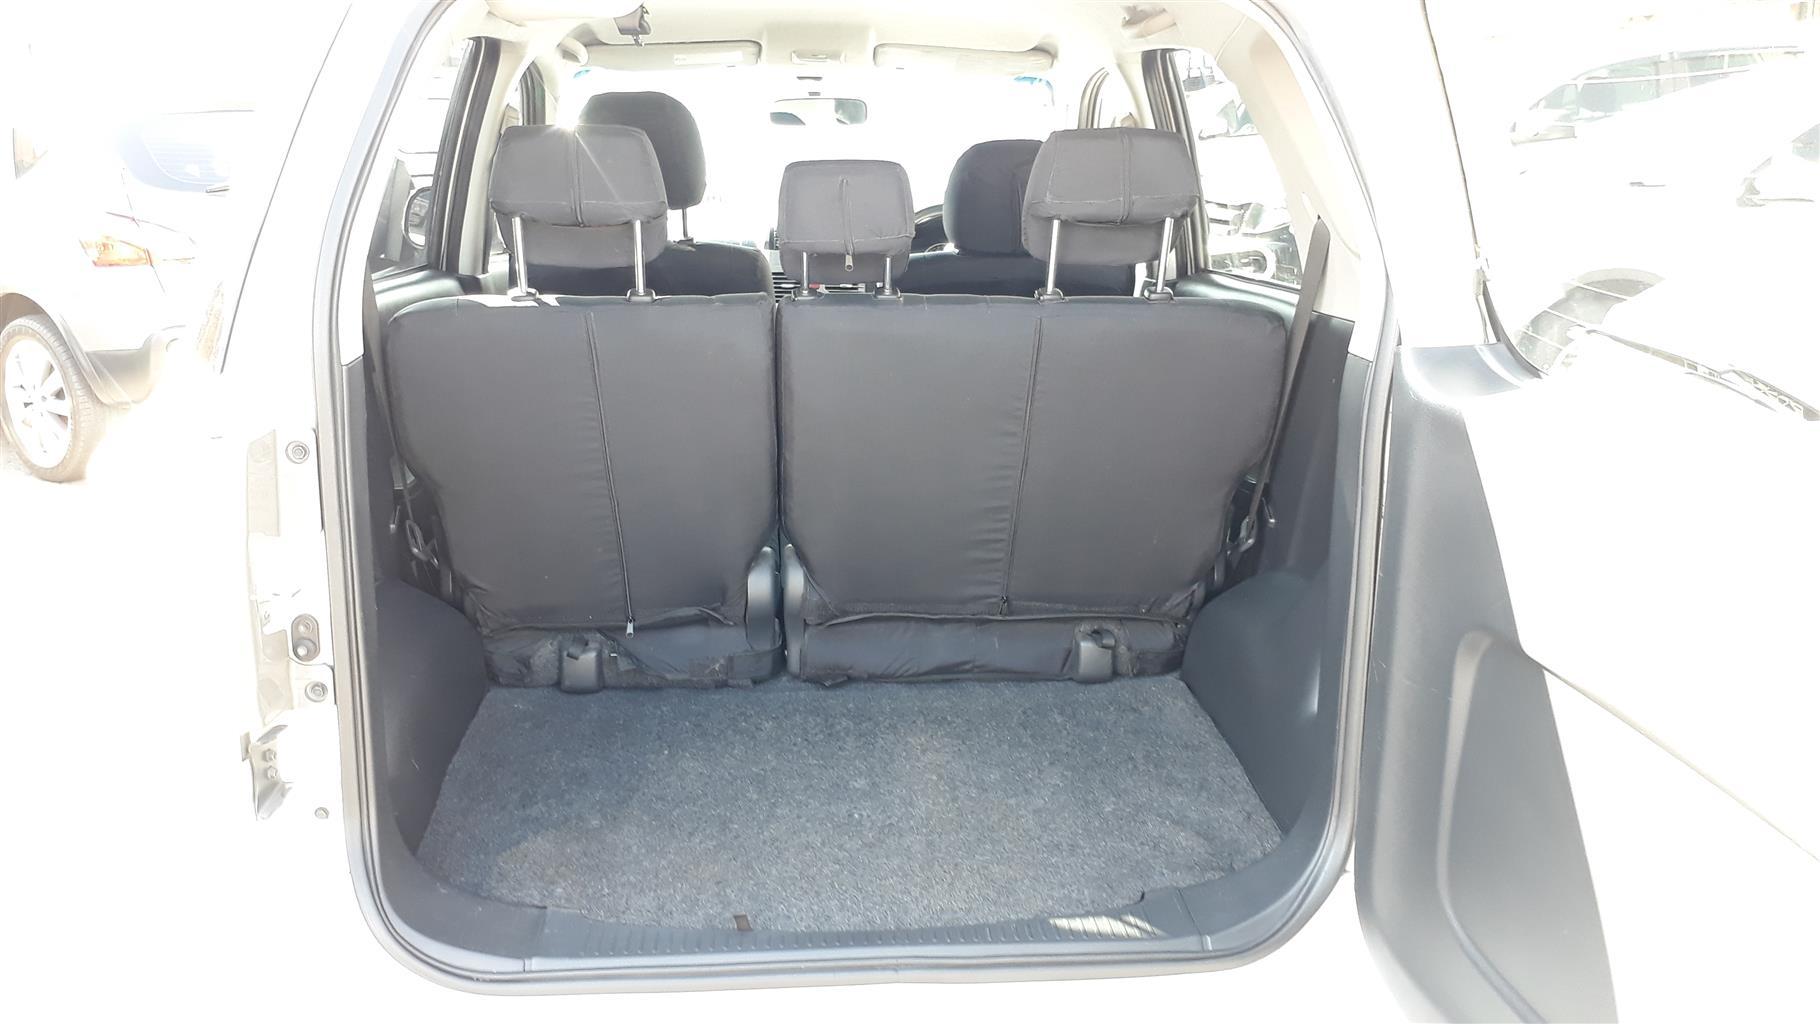 2011 Daihatsu Terios 1.5 4x4 automatic